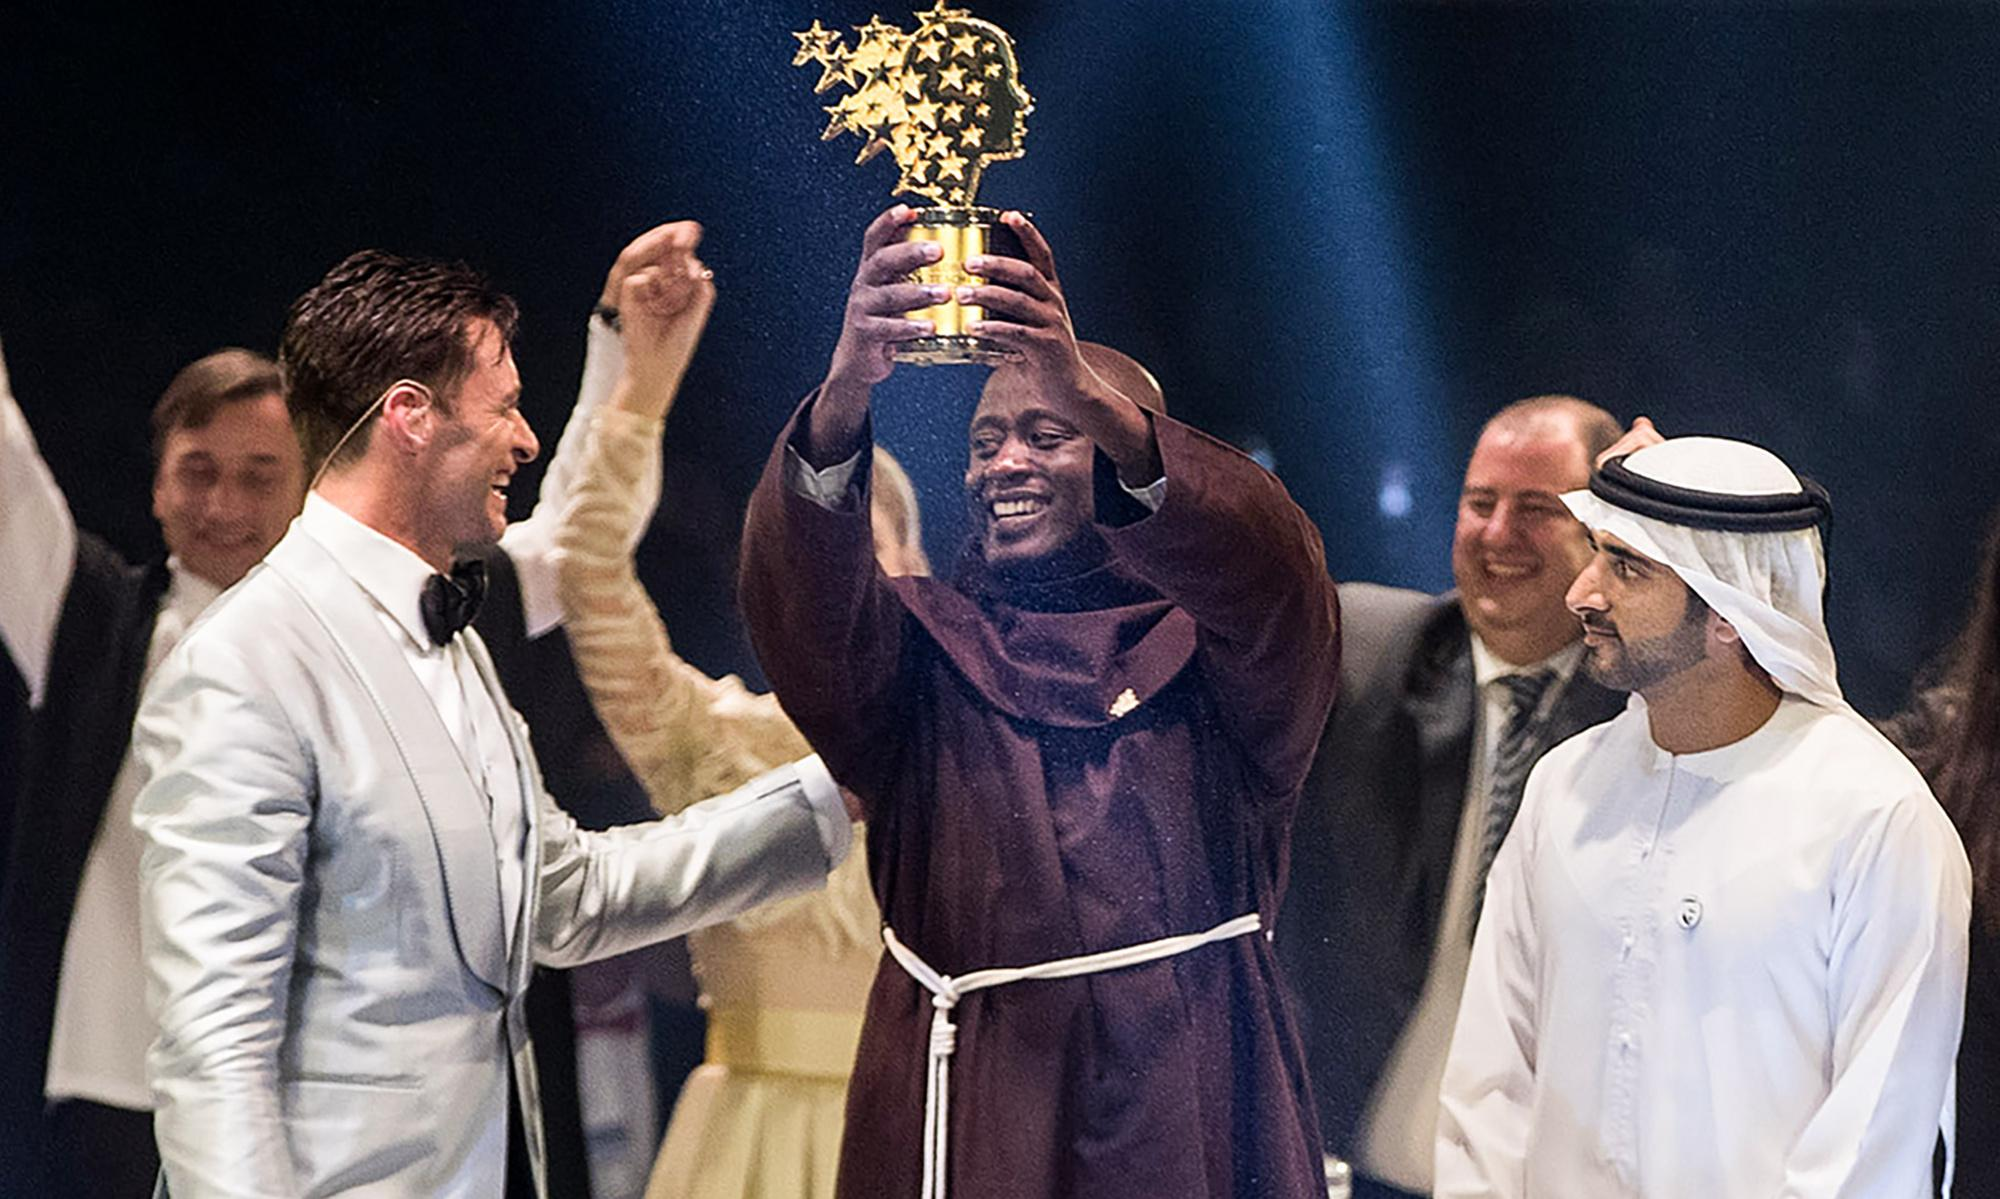 Kenyan science teacher Peter Tabichi wins $1m global award